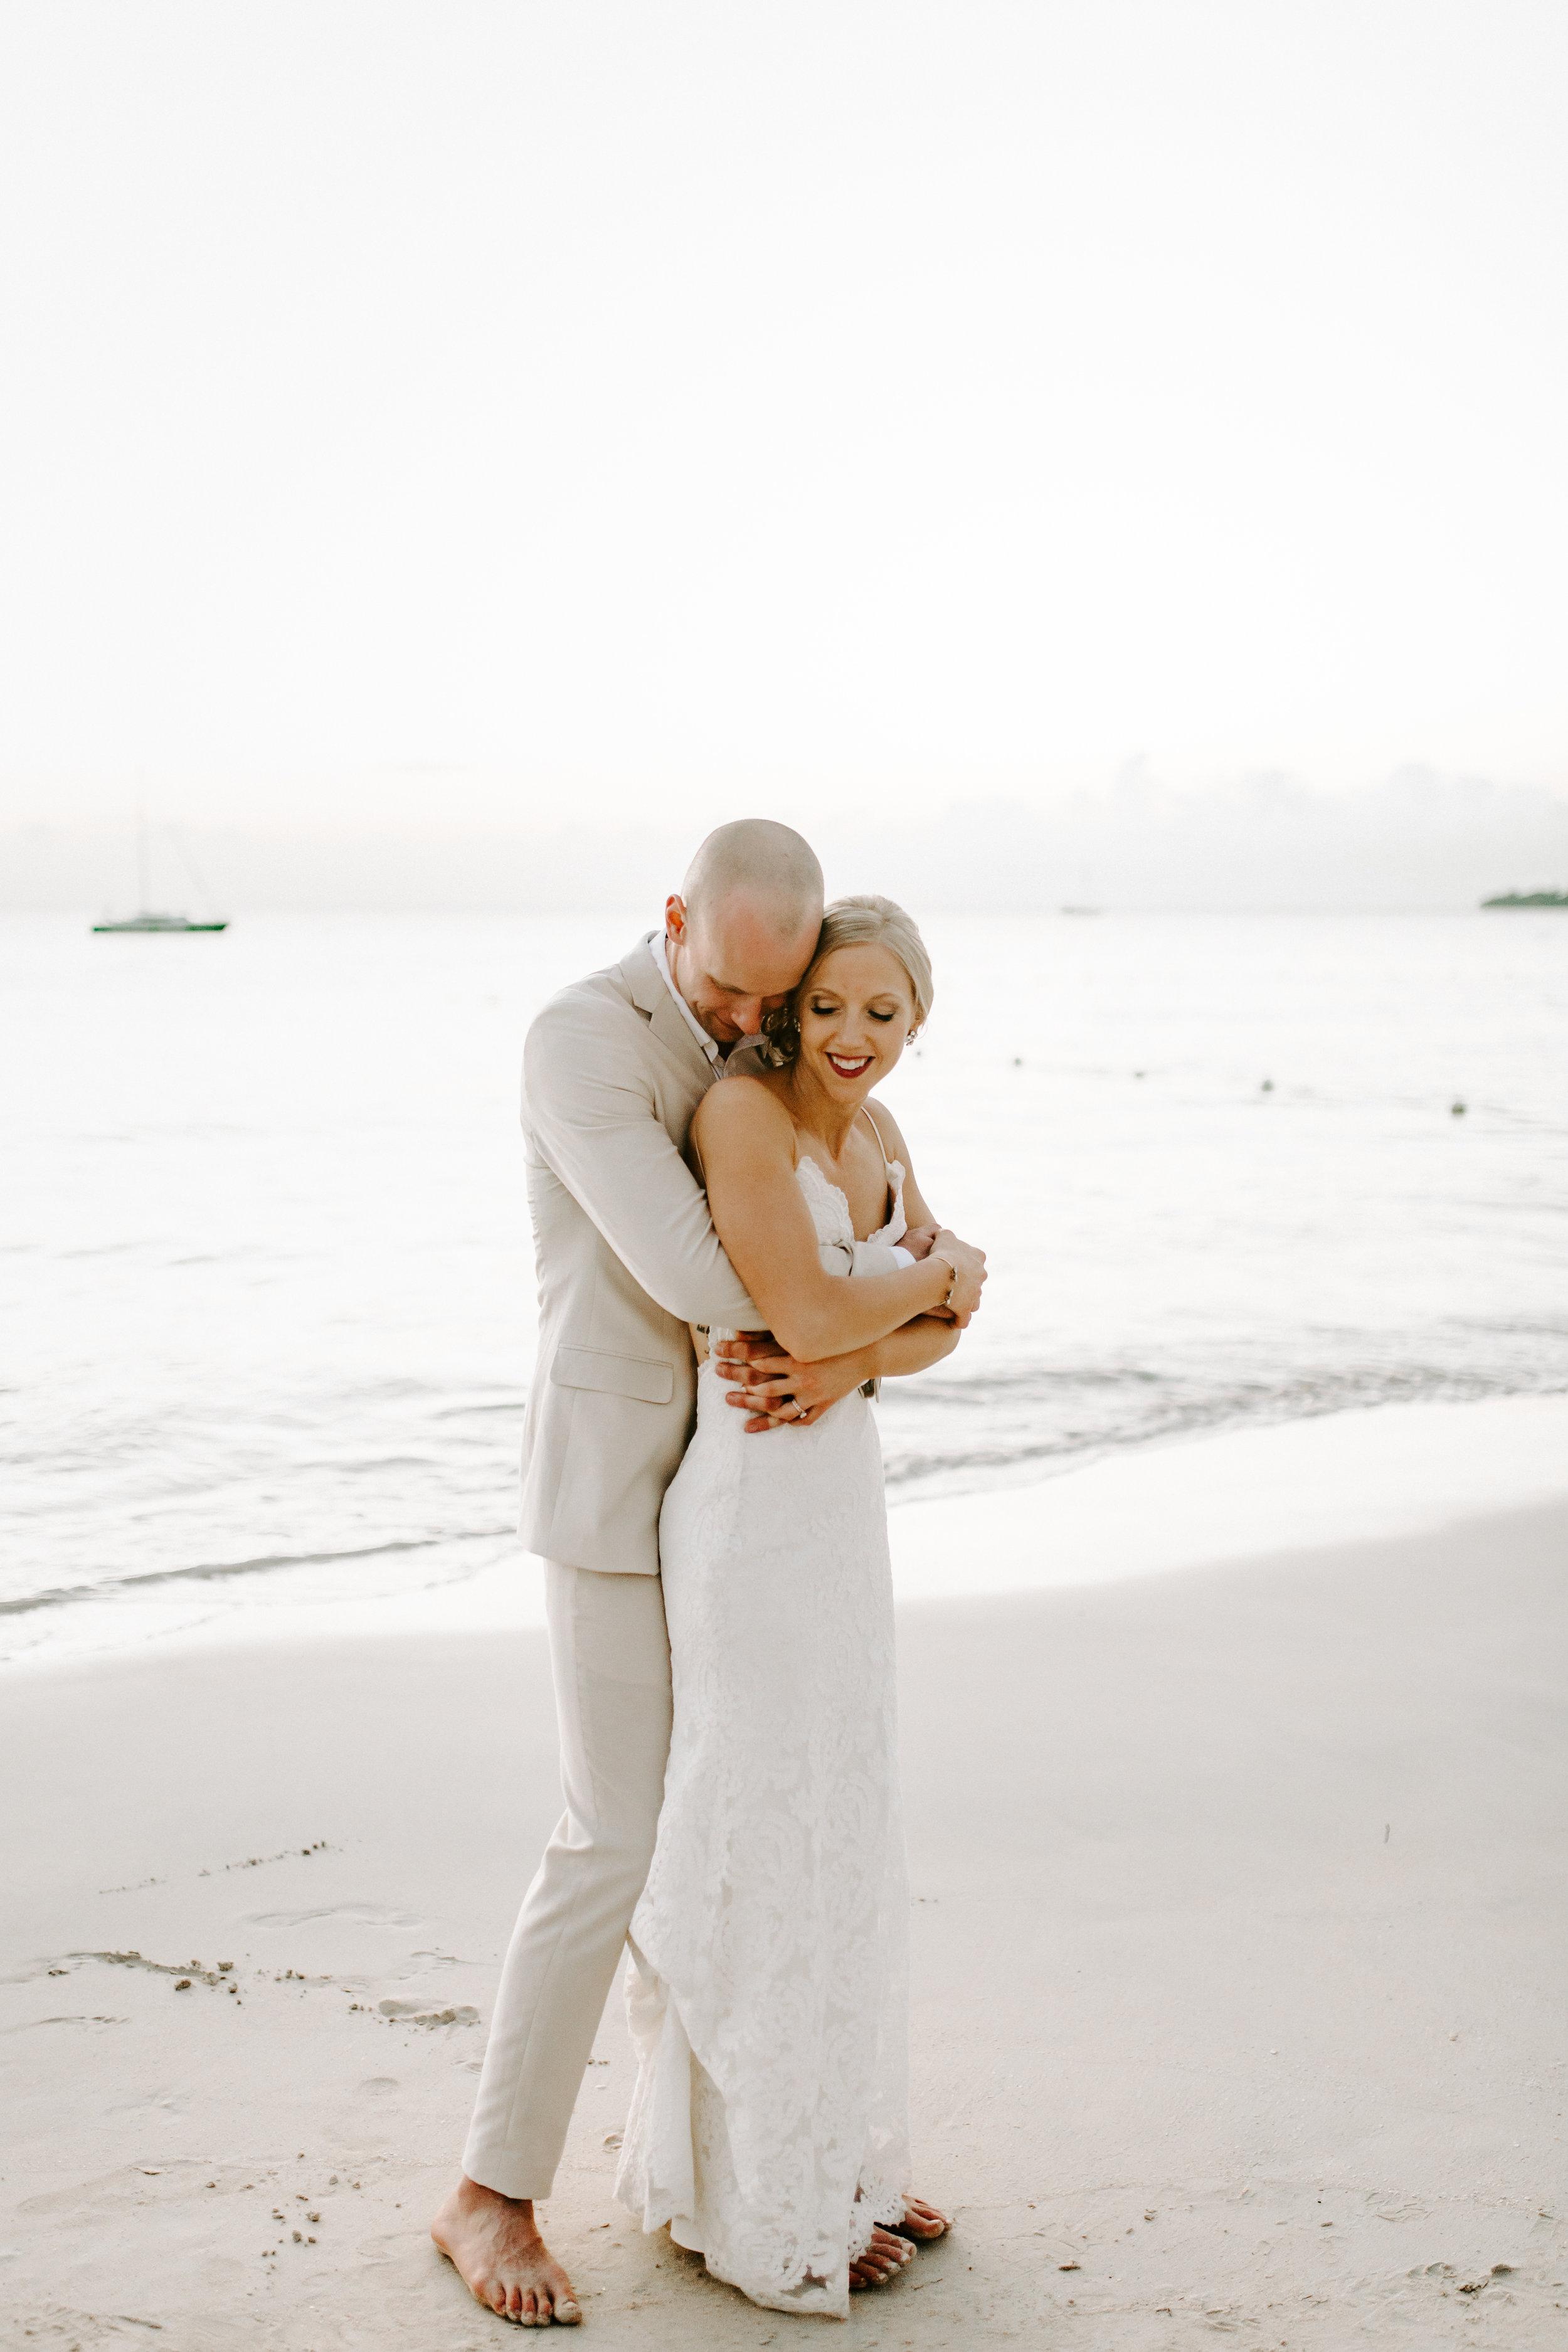 beach bride, beach wedding, destination wedding, wedding day, sunset photos, wedding dress, jamaica wedding, define fettle